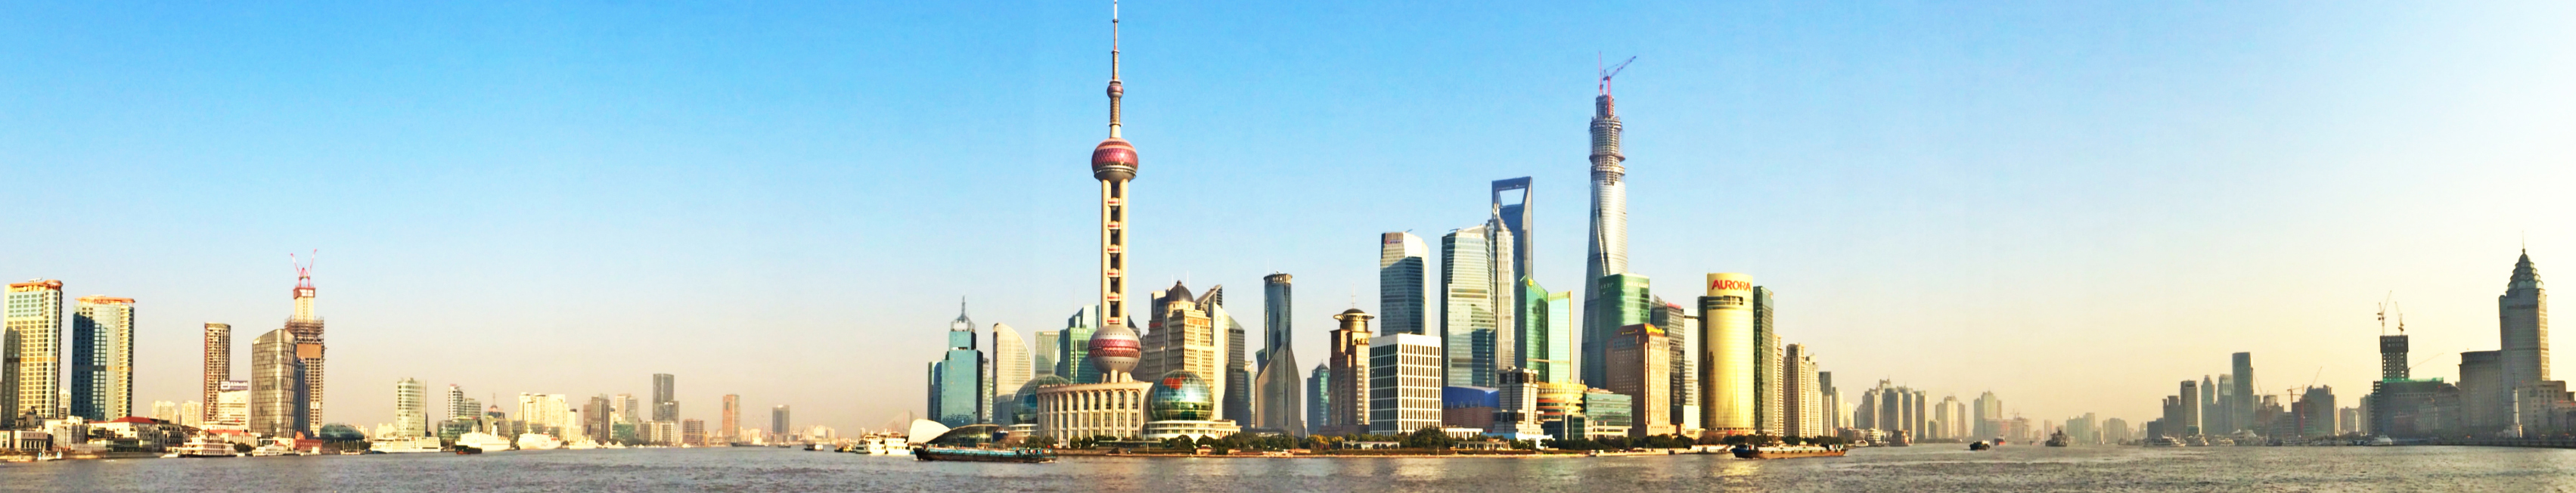 Shanghai Pudong Panorama Jan 2 2014